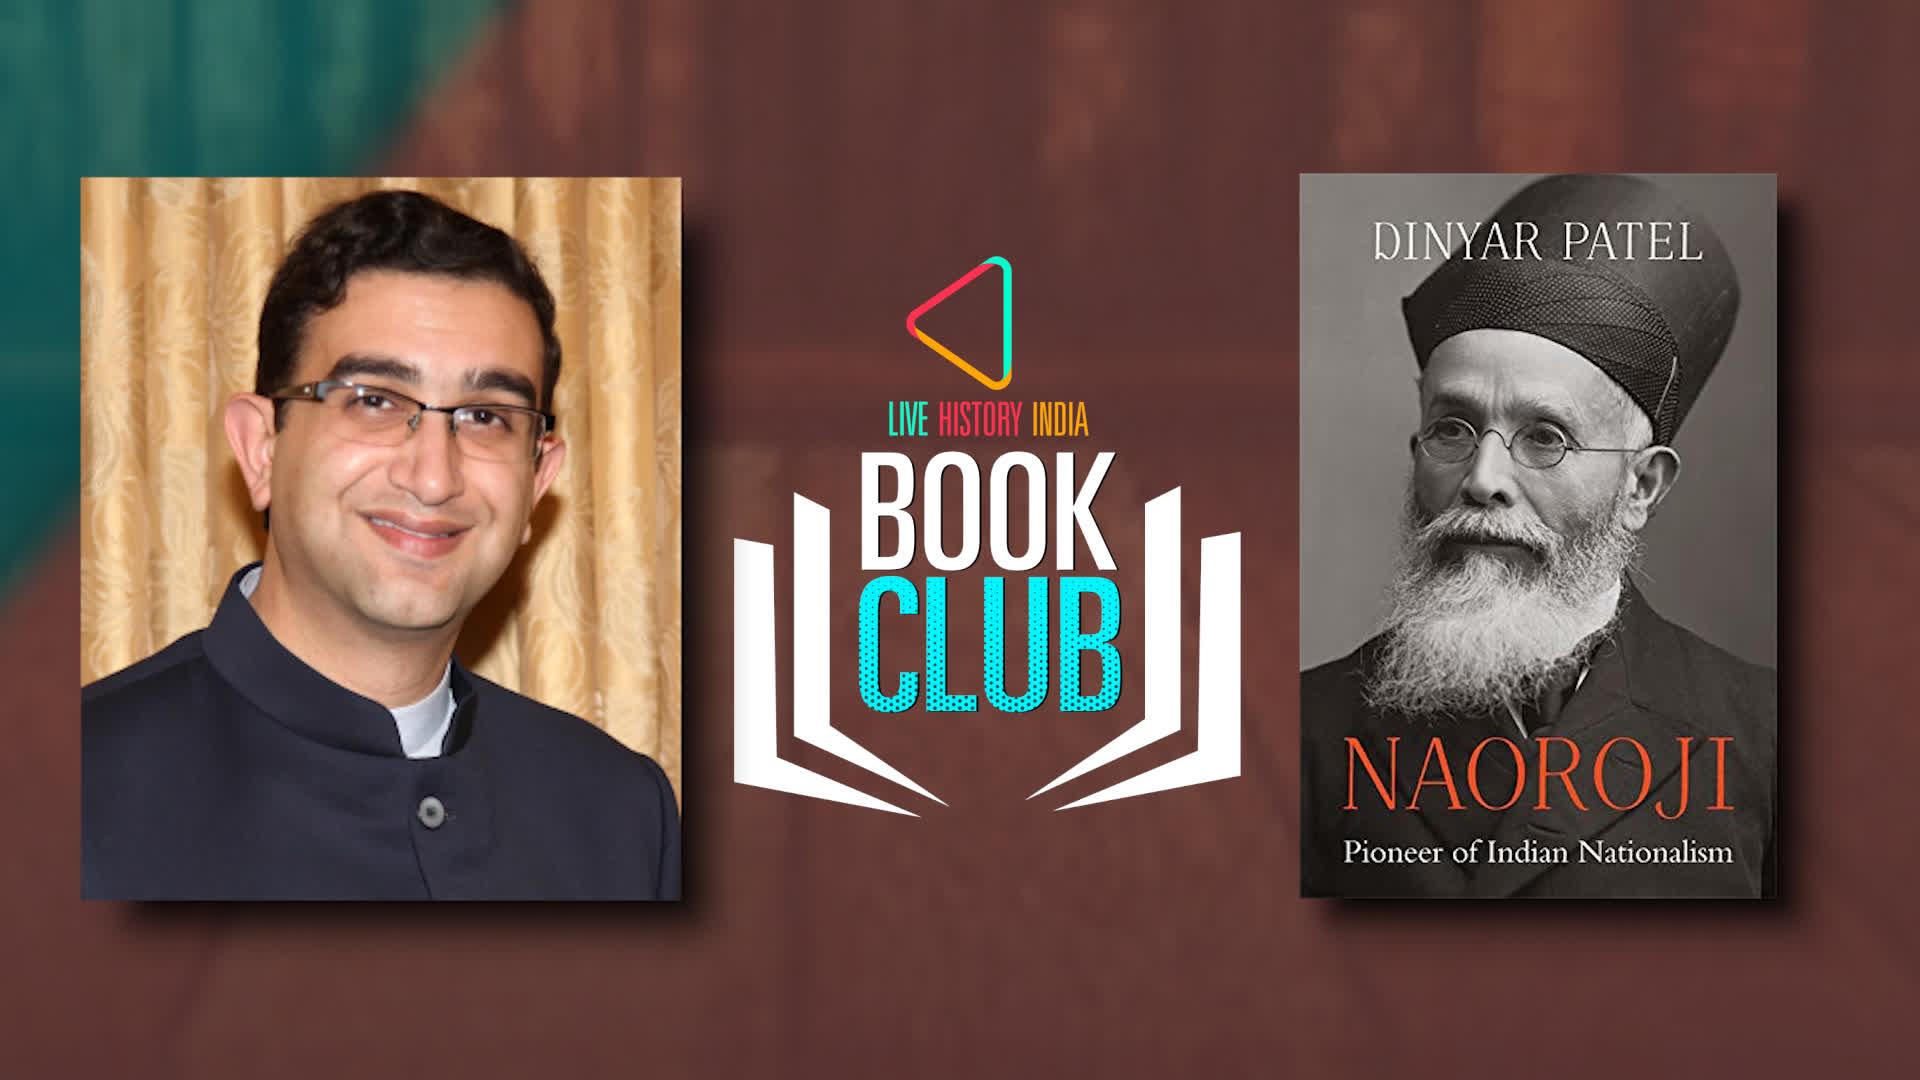 Dinyar Patel on Naoroji: Pioneer of Indian Nationalism